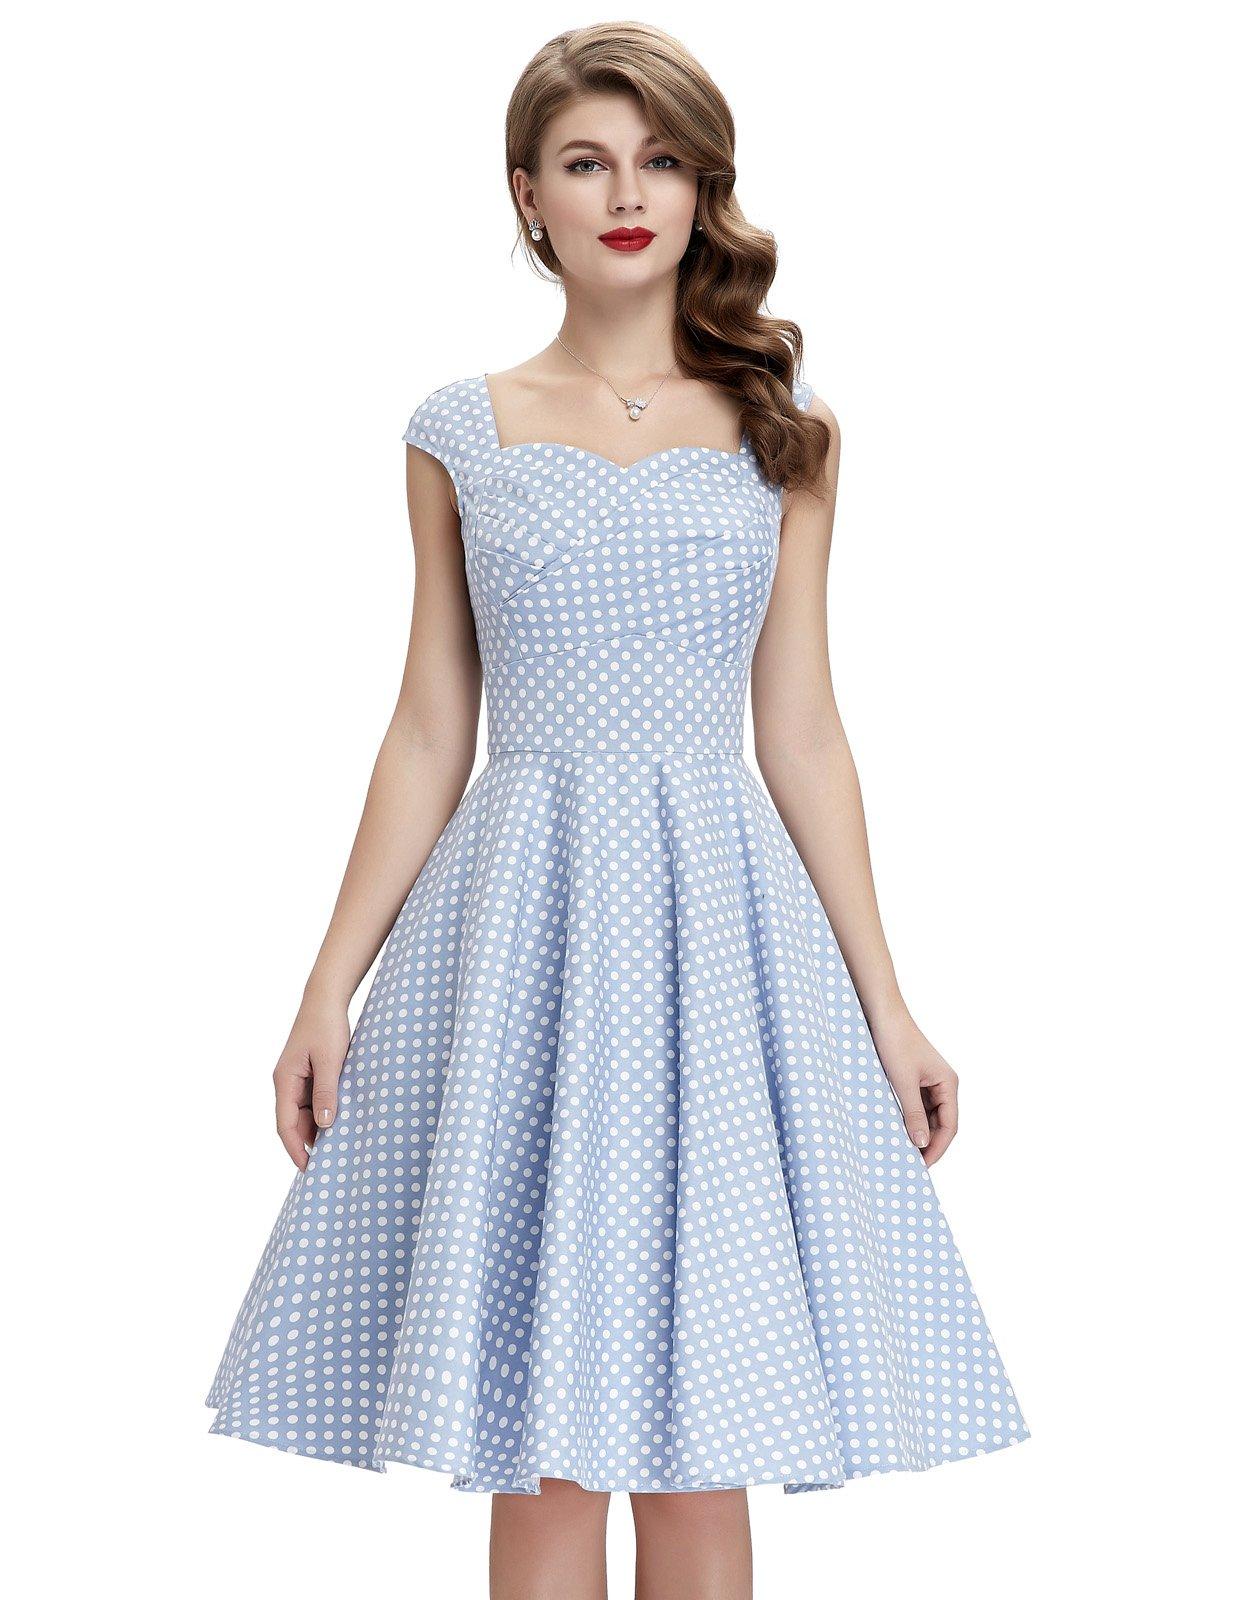 GRACE KARIN 1940's Dresses for Women Vintage Style Sleeveless Size XL BP105-4